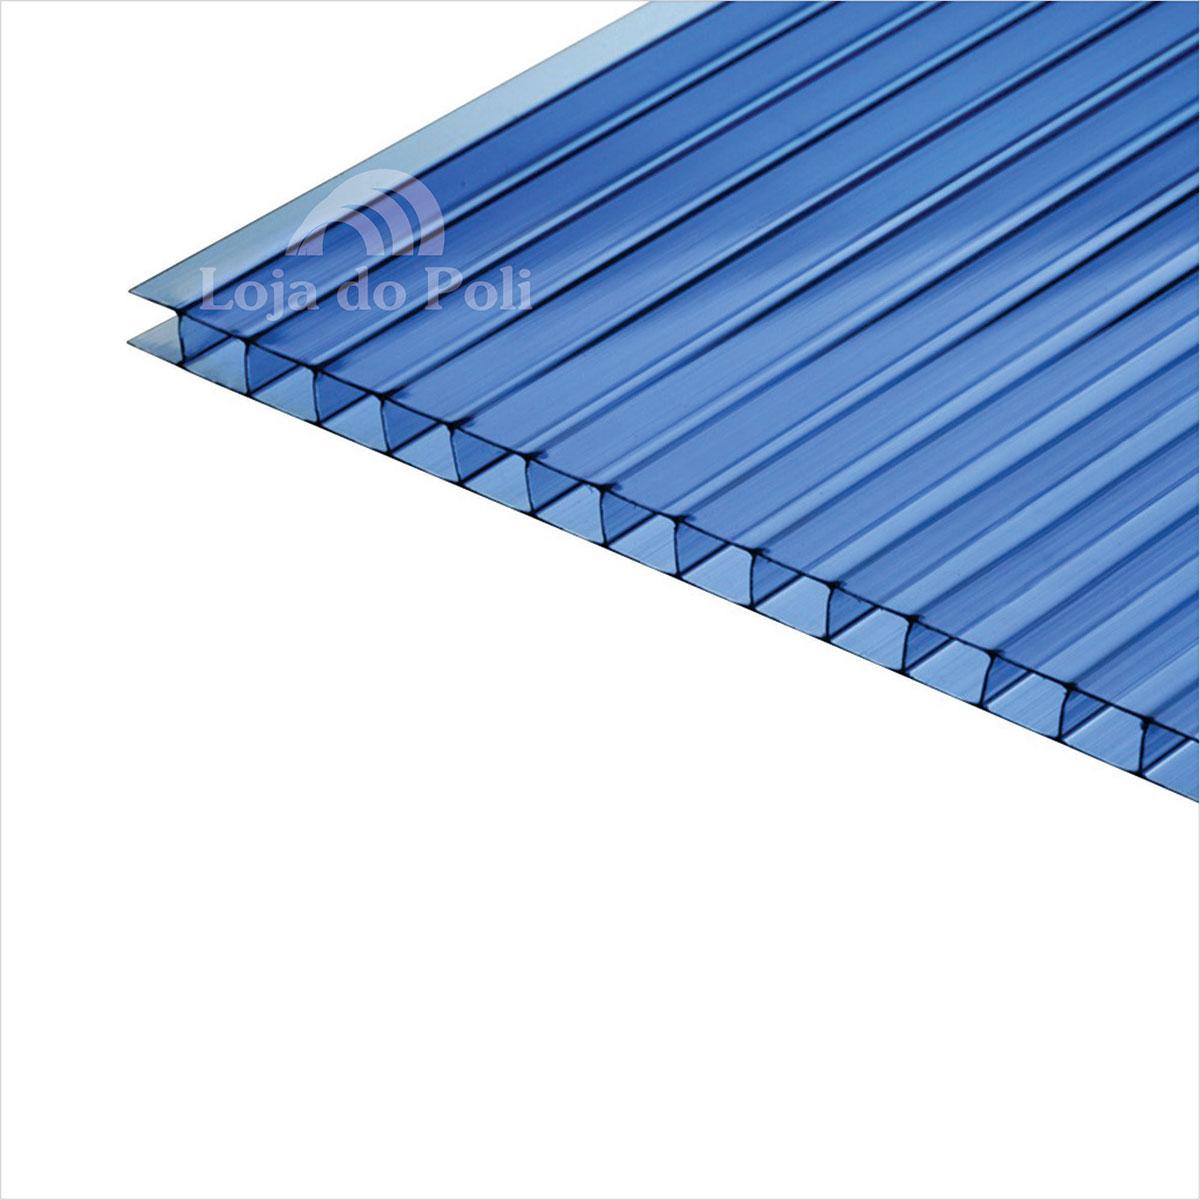 Chapa Policarbonato Alveolar Azul 6mm 1,0x6,0m